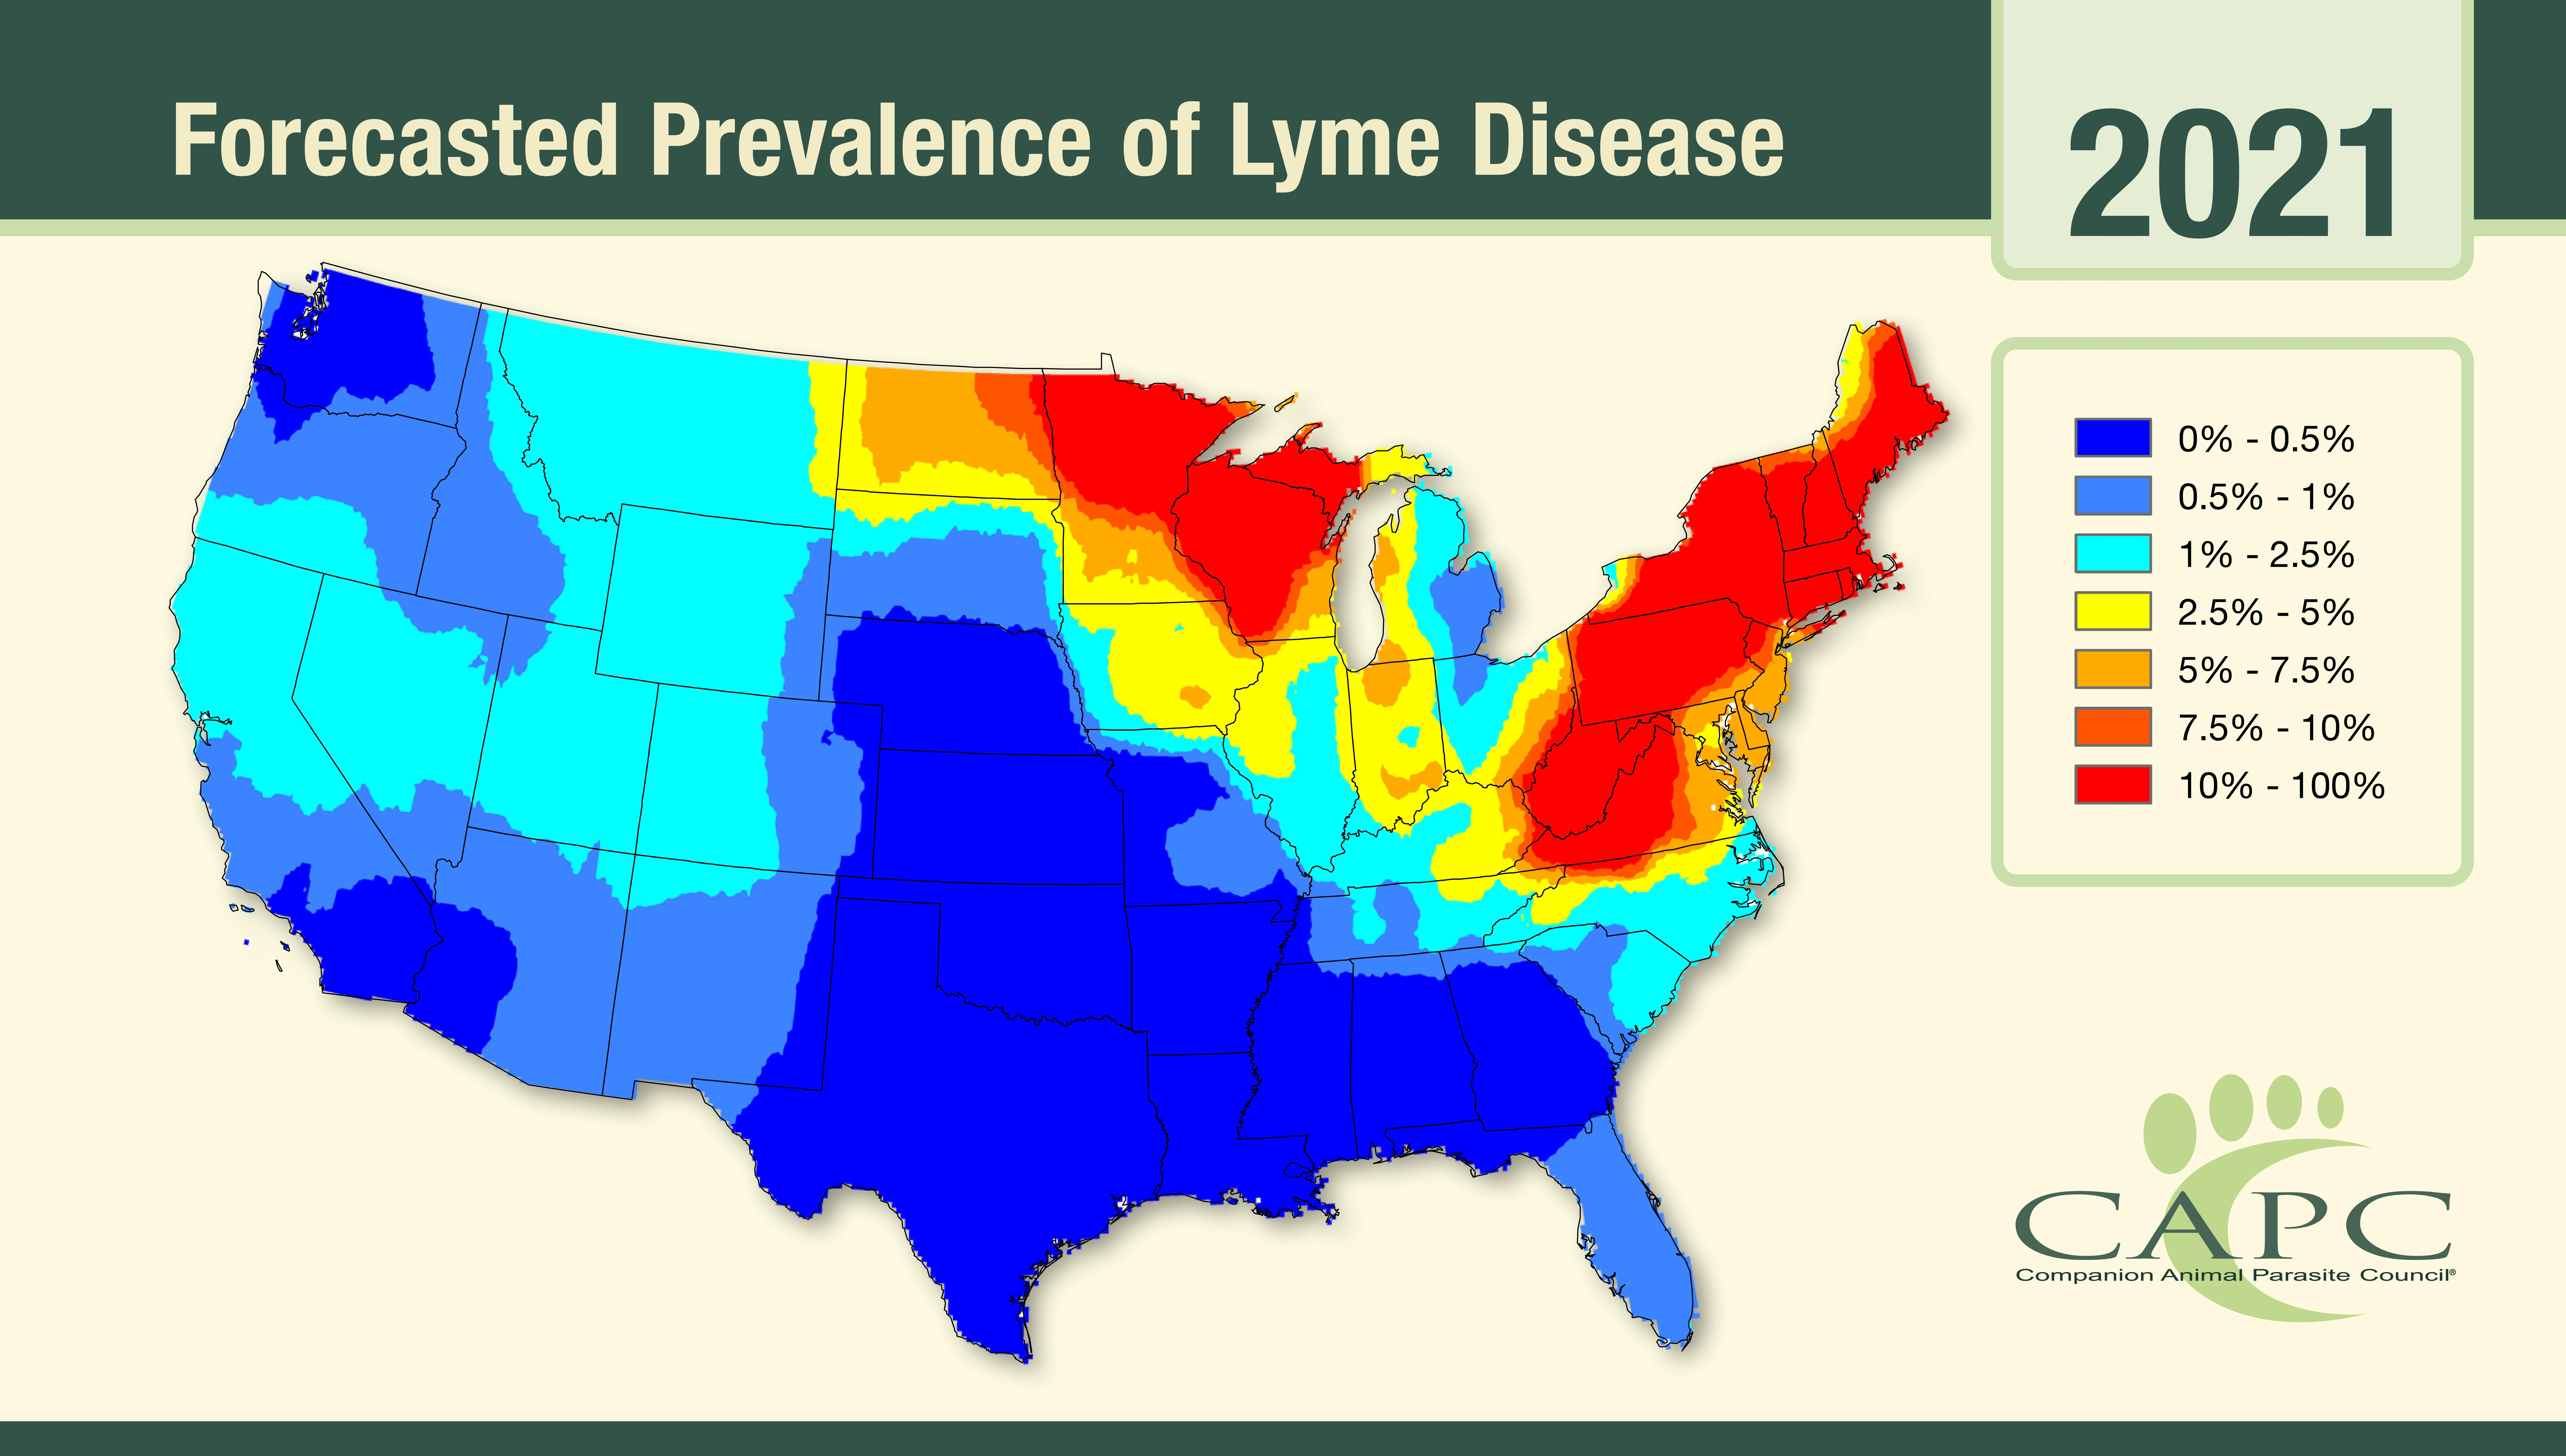 20210406 Capc Forecast Maps Display V1 Lyme